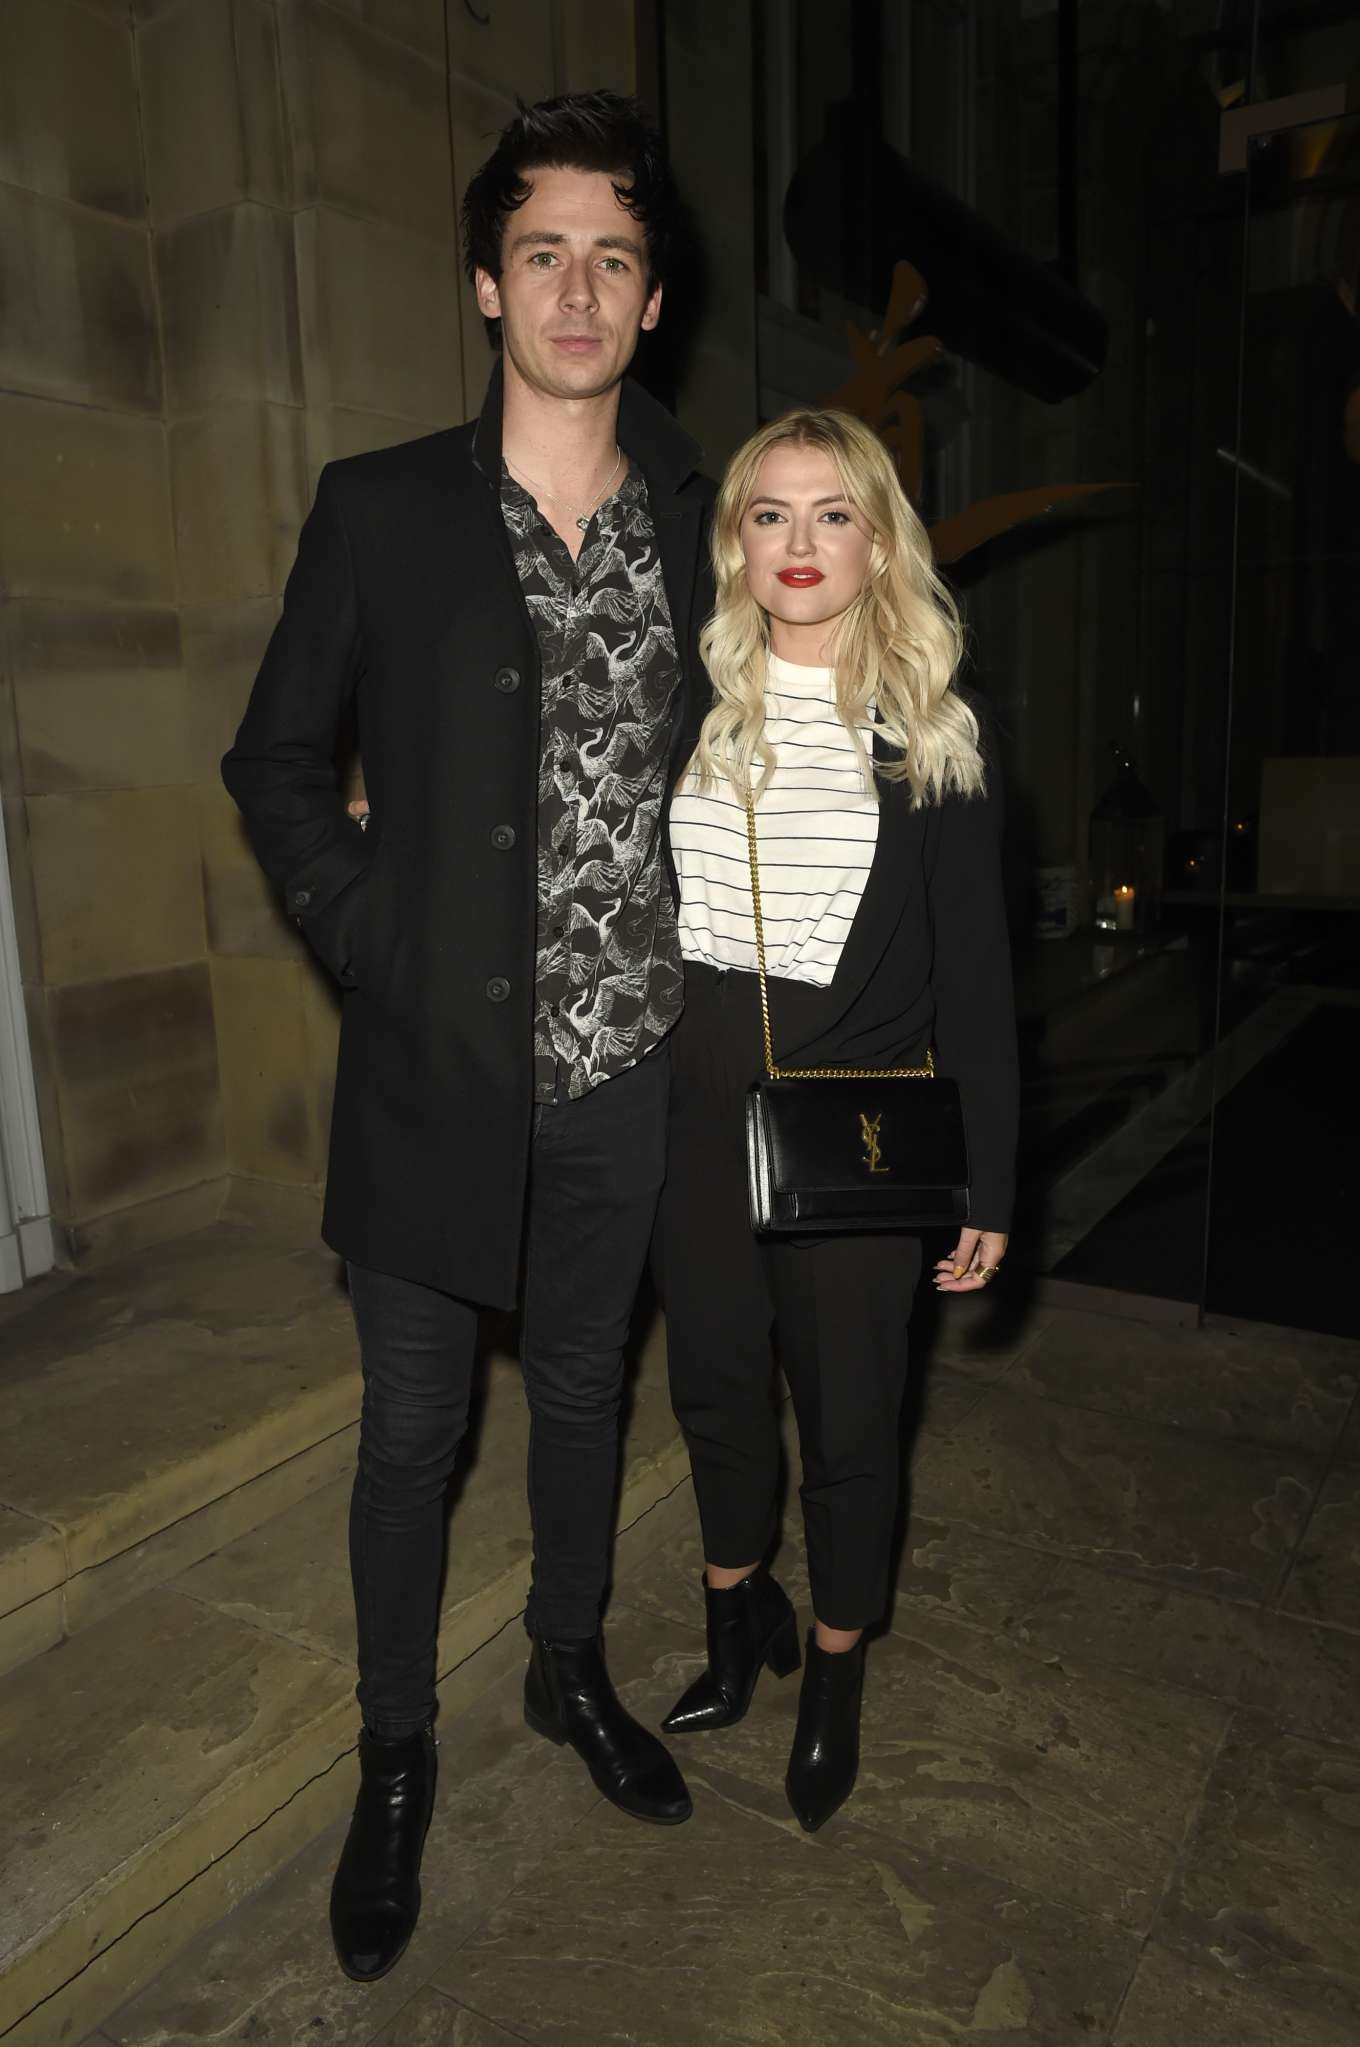 Lucy Fallon and her boyfriend Tom Leech at Peter Street Kitchen Restaurant in Manchester